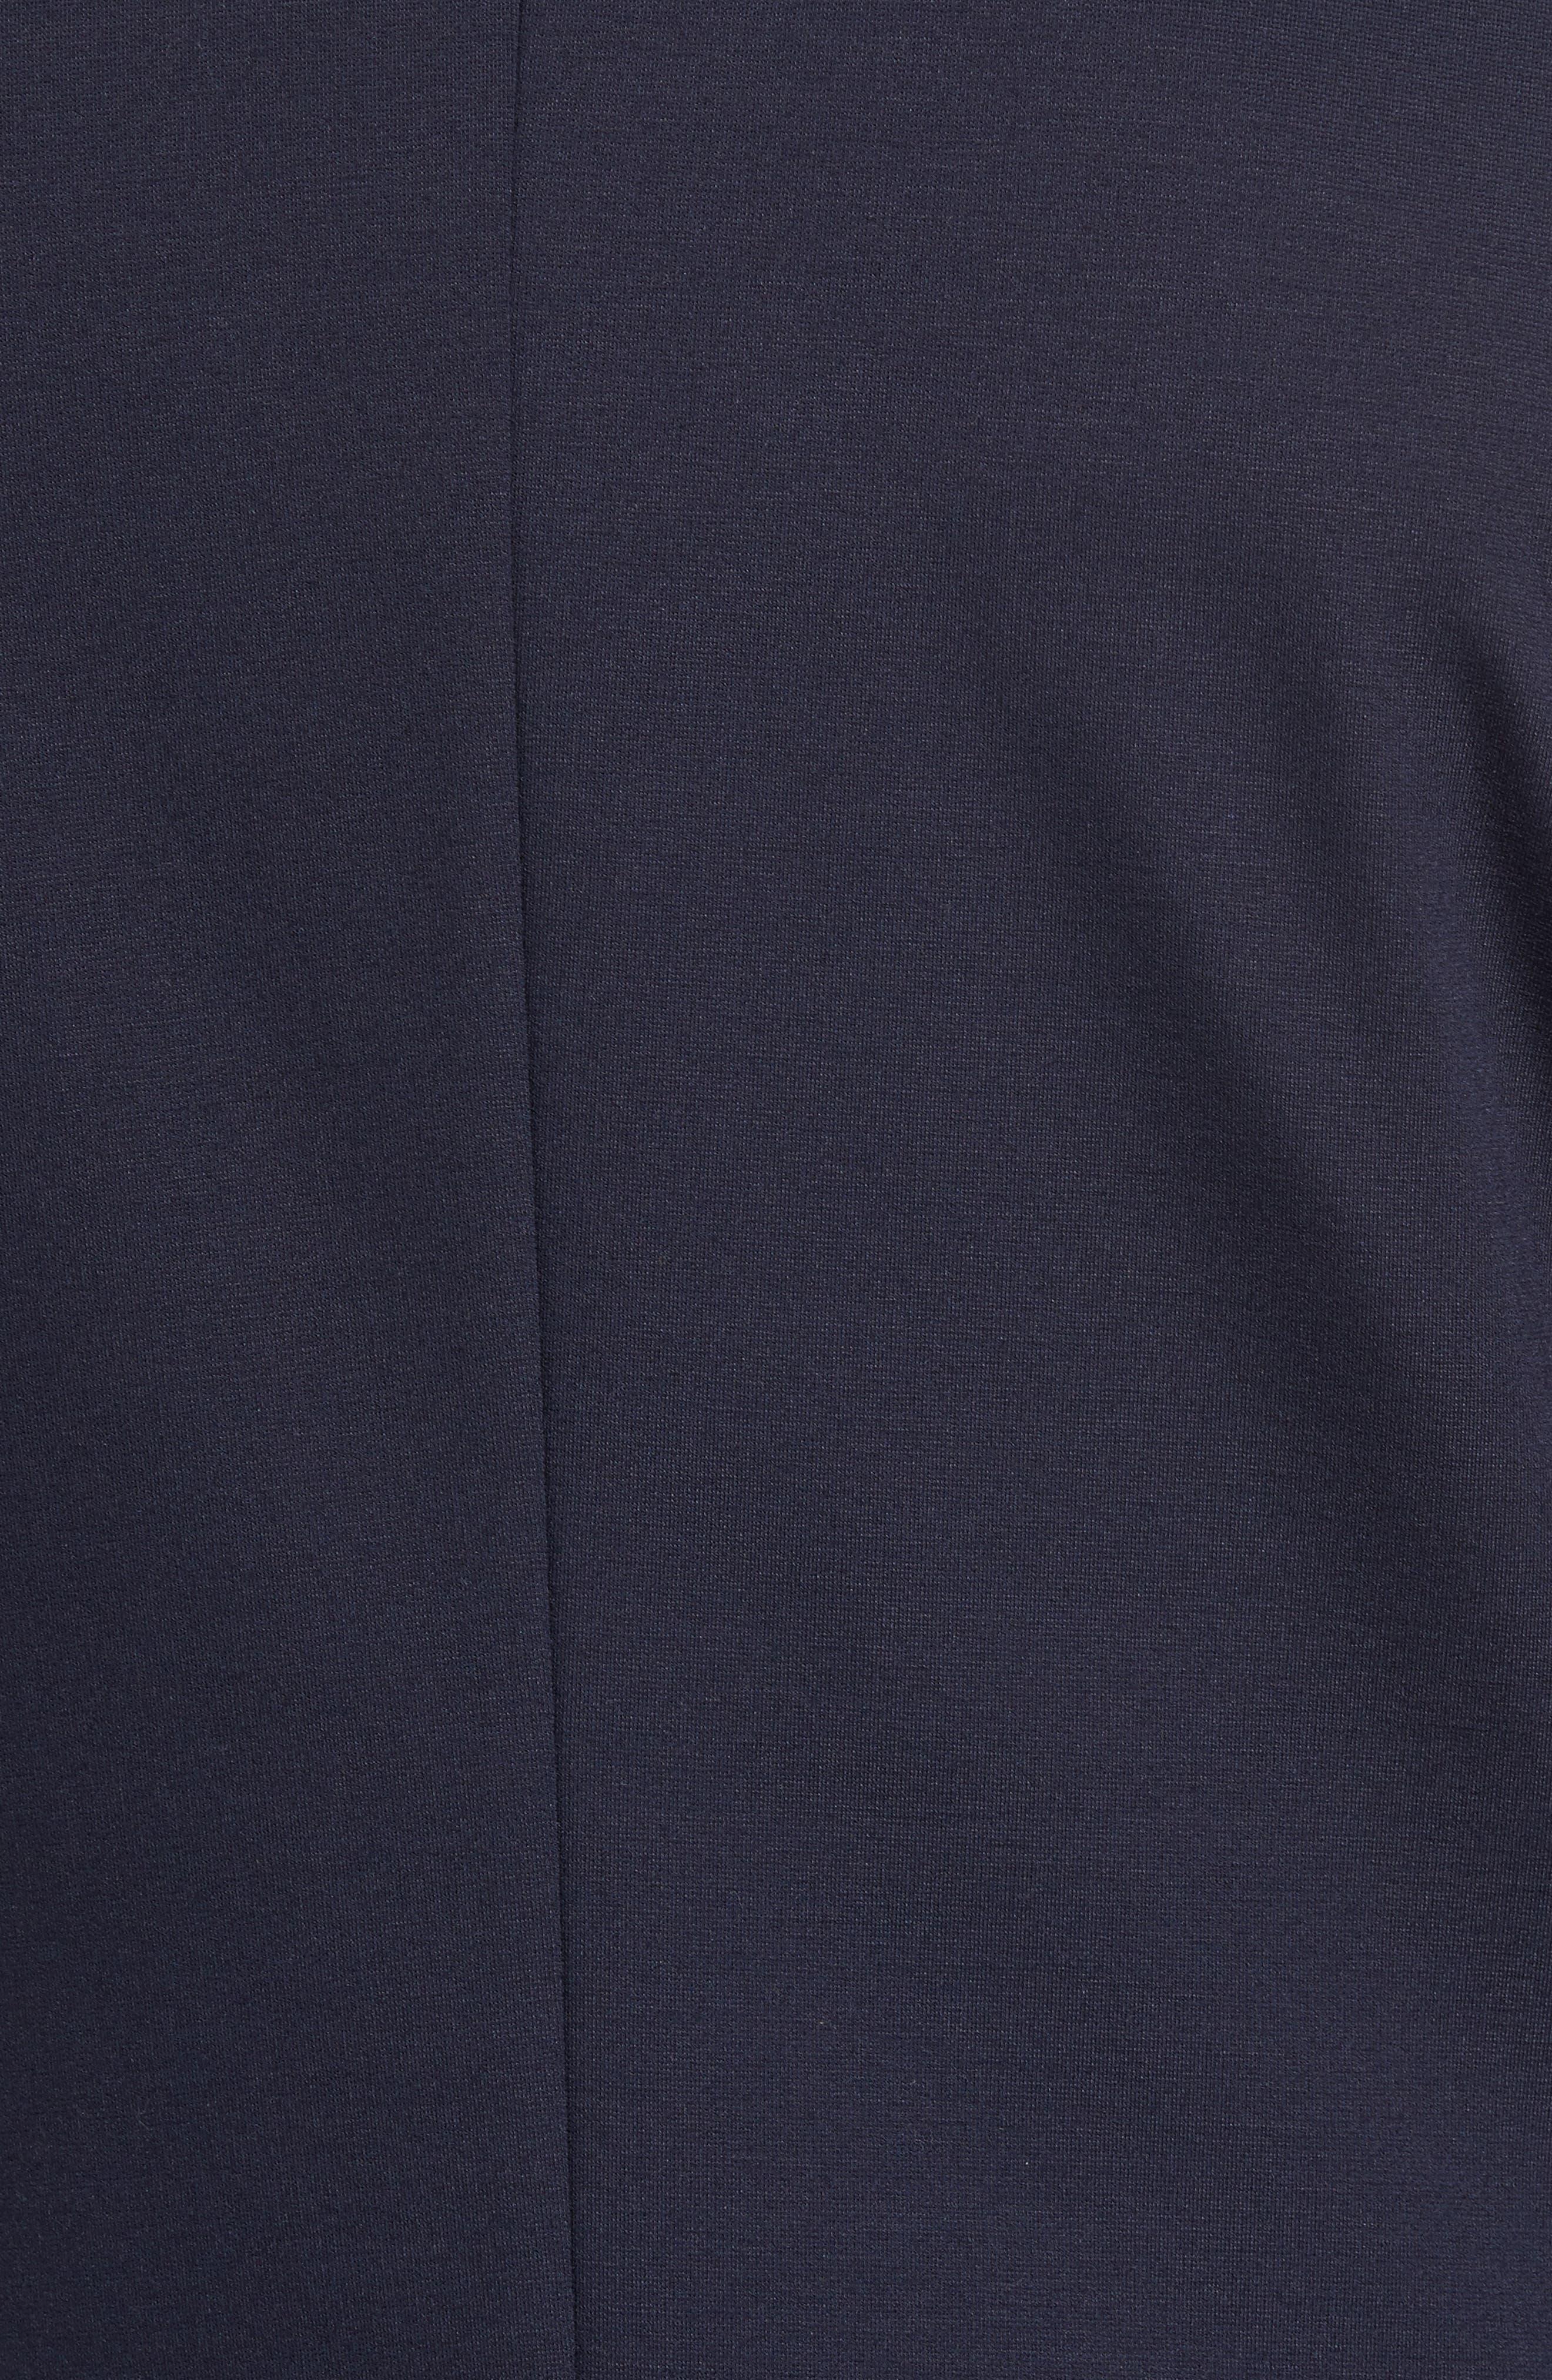 Norwin Trim Fit Stretch Blazer,                             Alternate thumbnail 5, color,                             Dark Blue